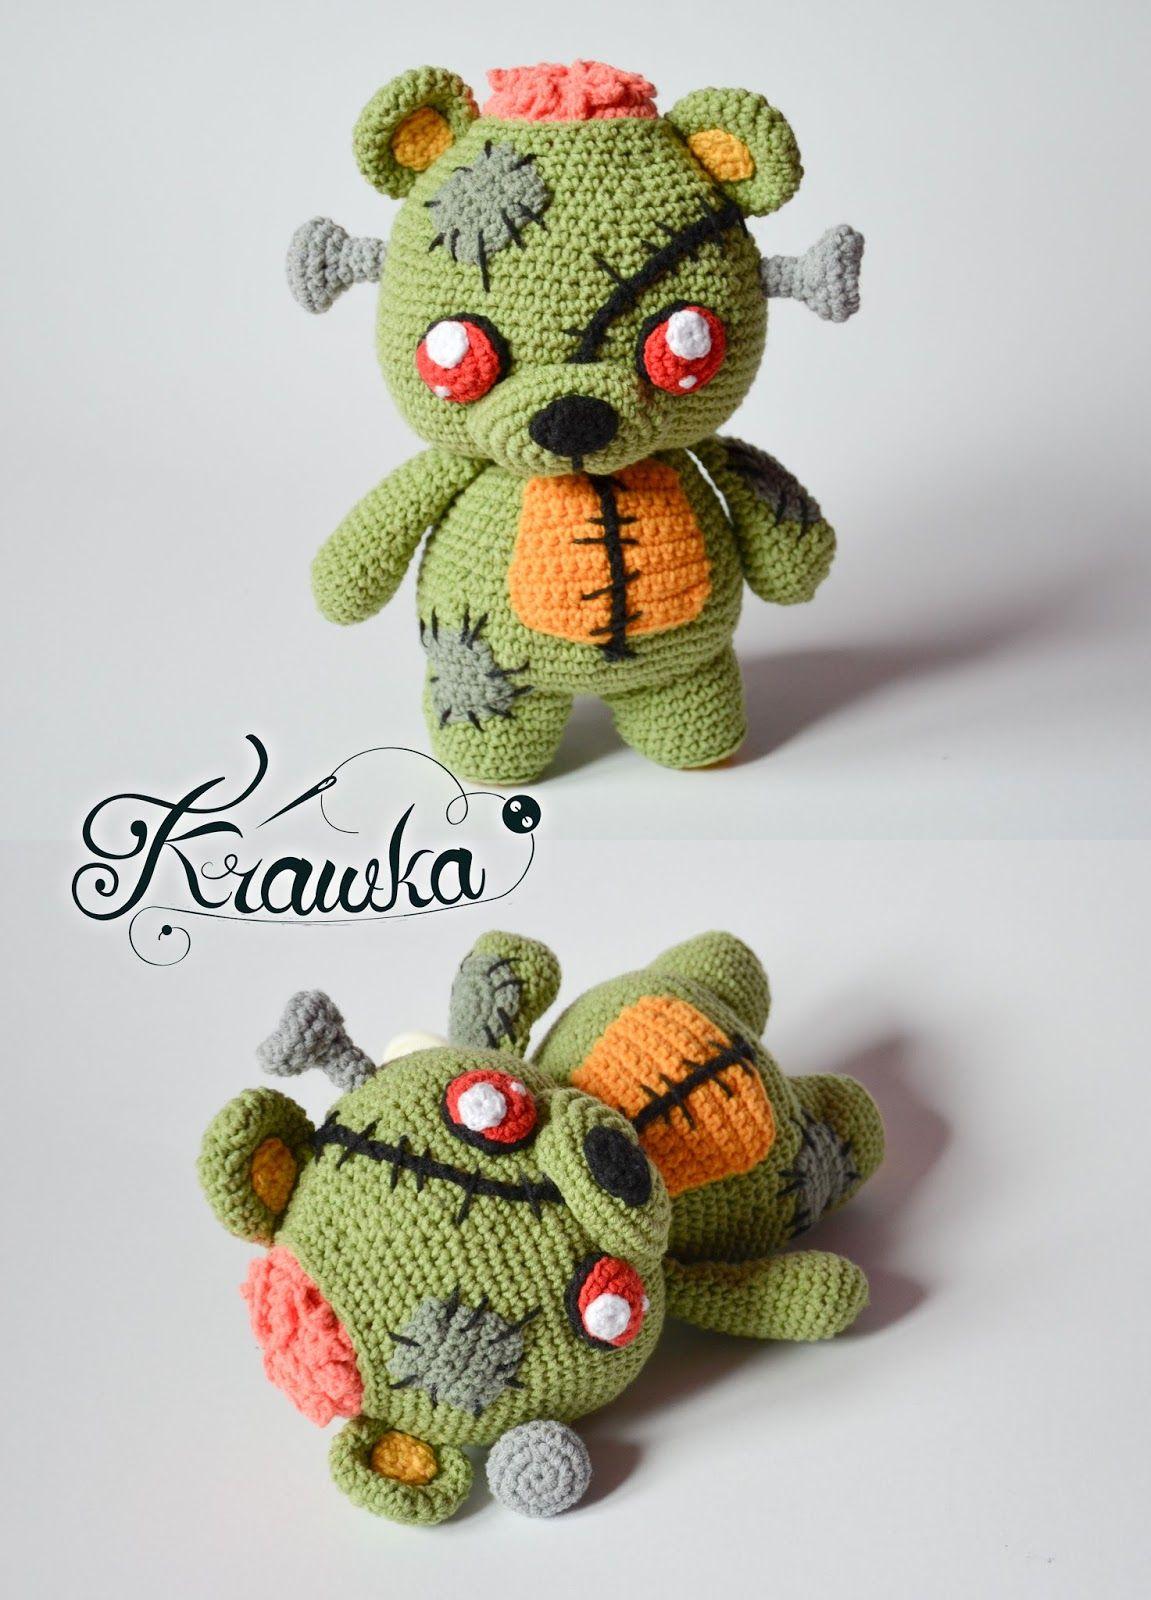 Krawka: Frankie the zombie bear - merger of teddy bear and ...